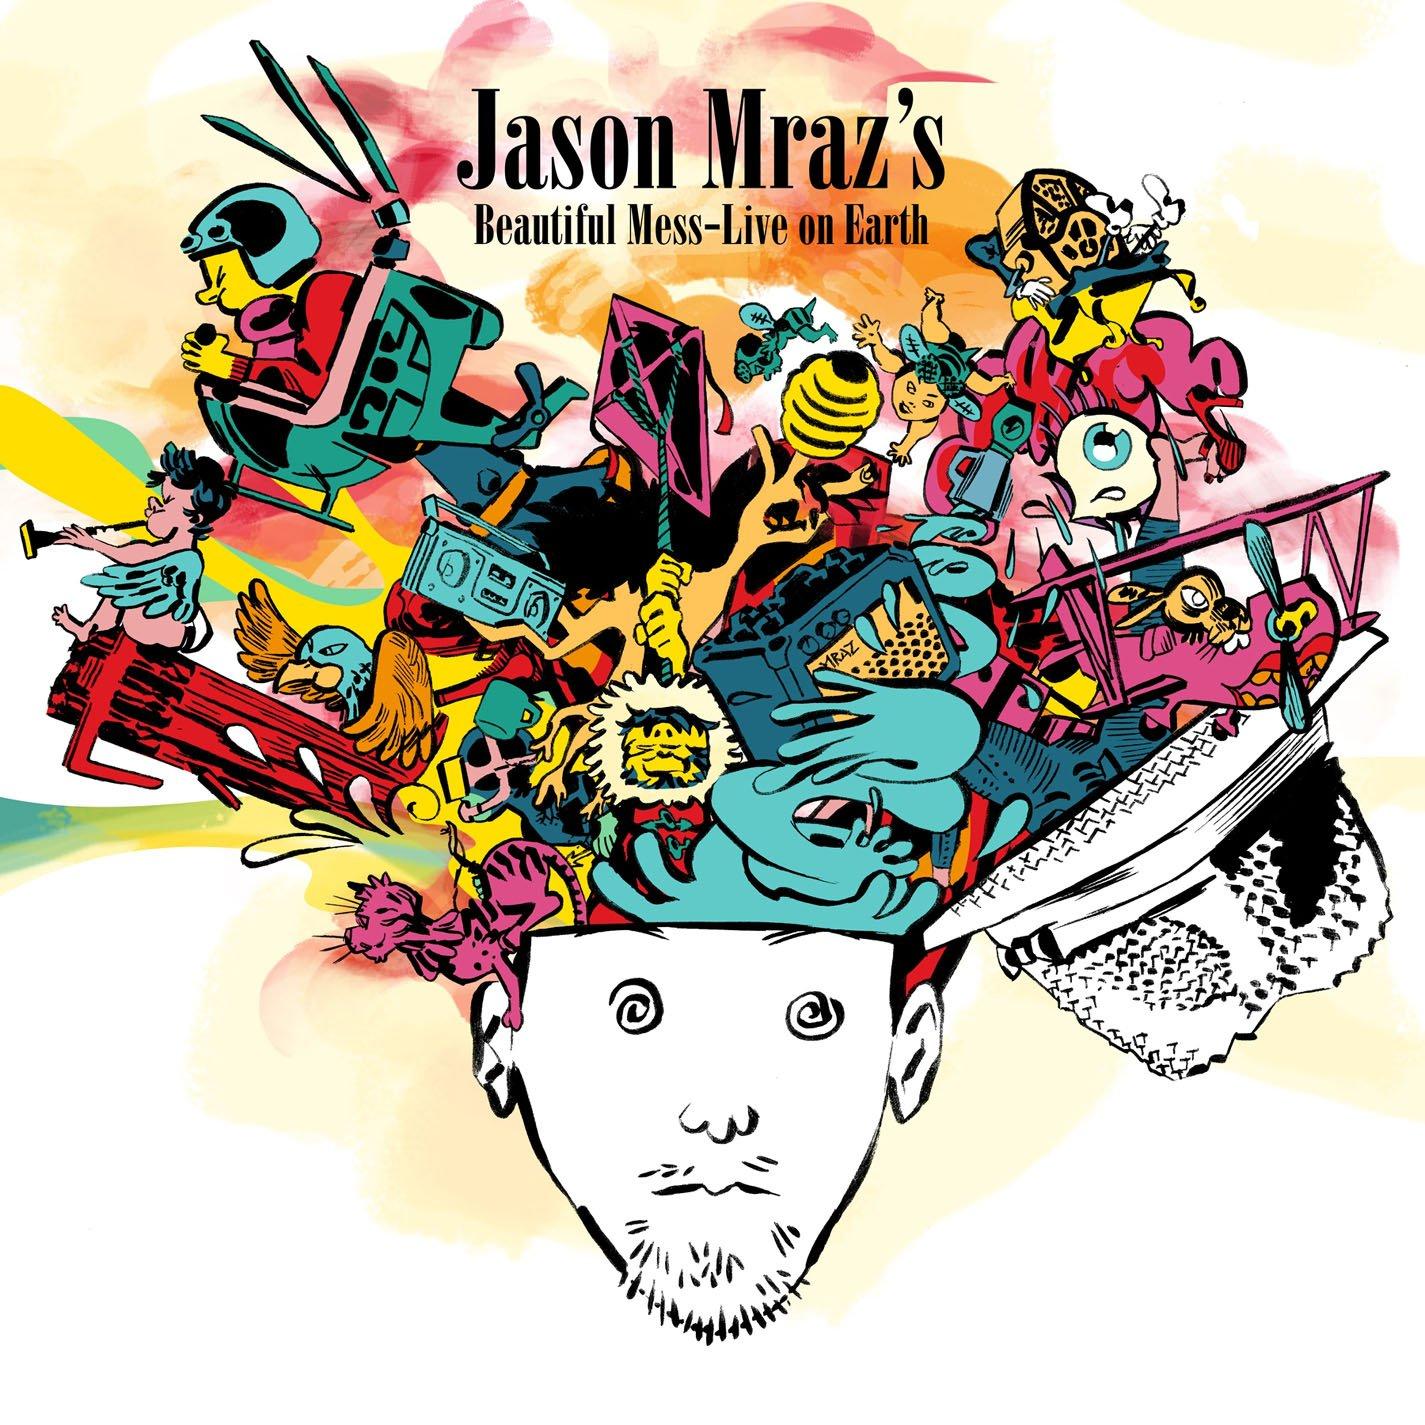 Jason Mraz, Jason Mraz's Beautiful Mess - Live from Earth